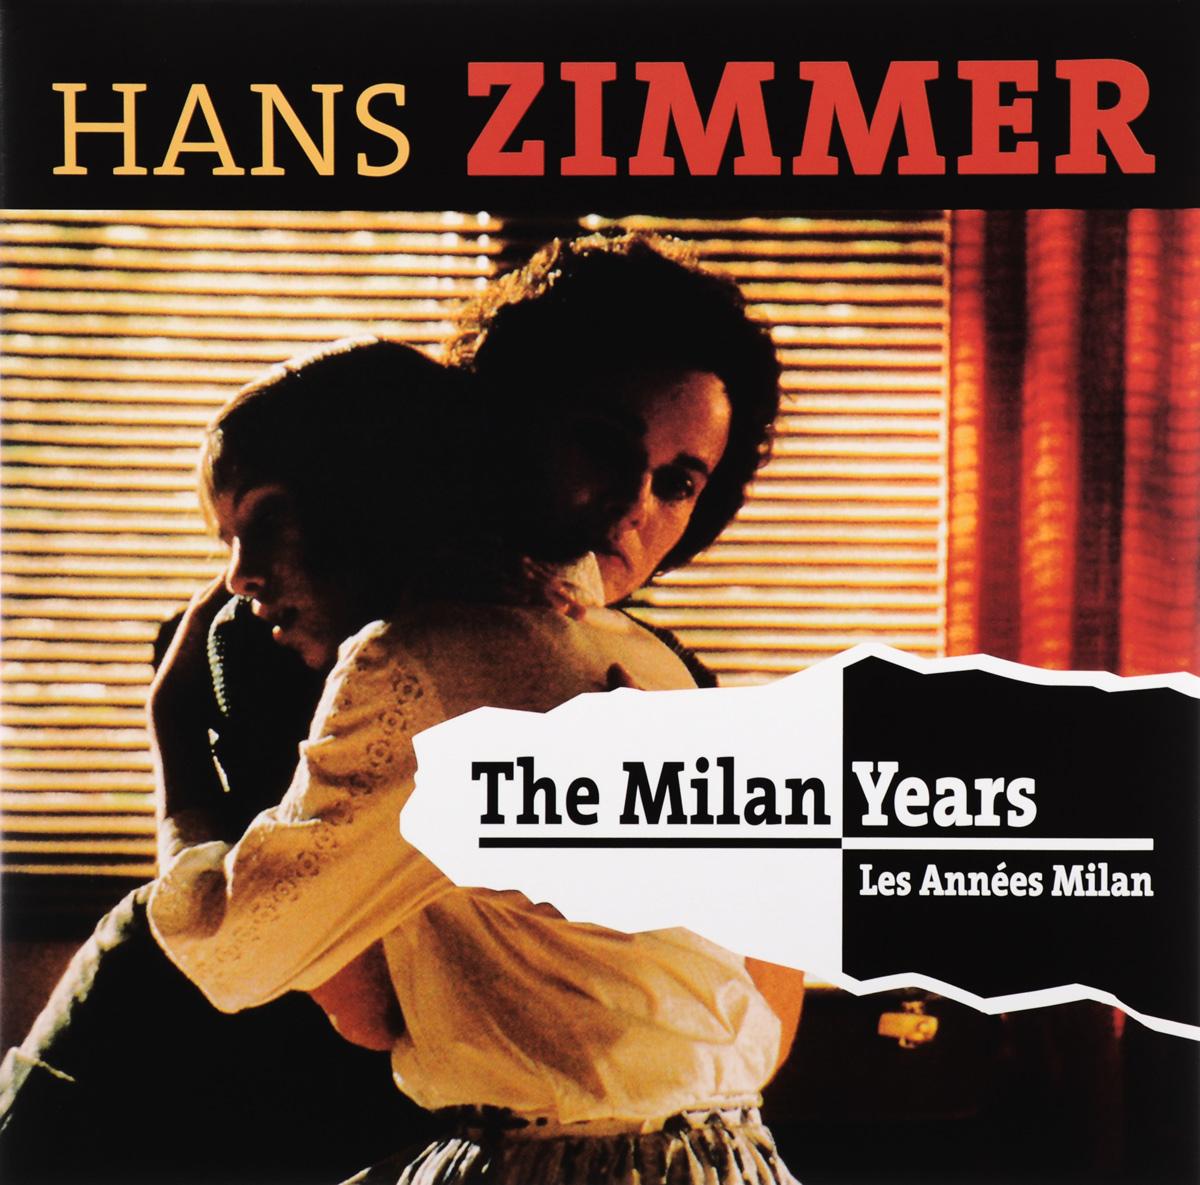 Ганс Циммер Hans Zimmer. The Milan Years (2 LP) hans zimmer hans zimmer the world of hans zimmer a symphonic celebration 3 lp 180 gr